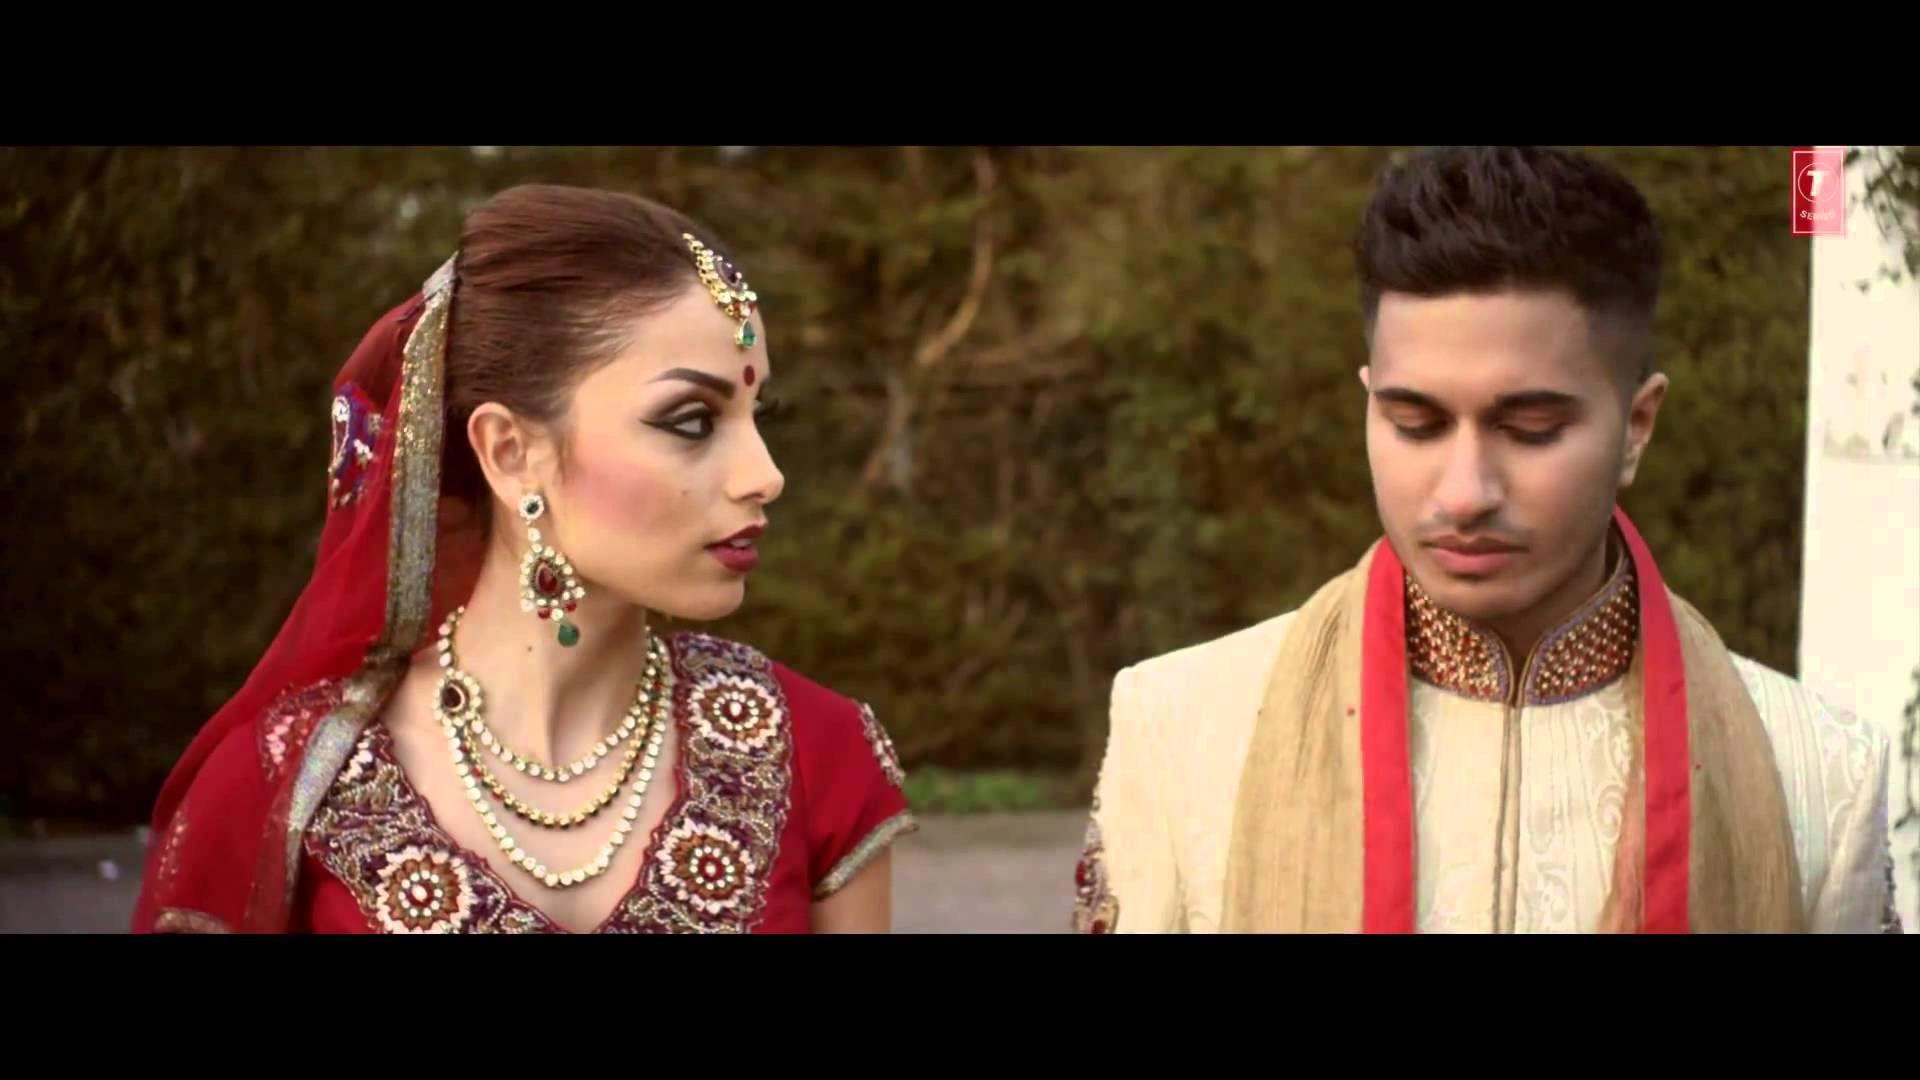 I Ll Be Waiting Kabhi Jo Baadal Barse Arjun Feat Arijit Singh Full Vid Waiting Song Indian Movie Songs Songs